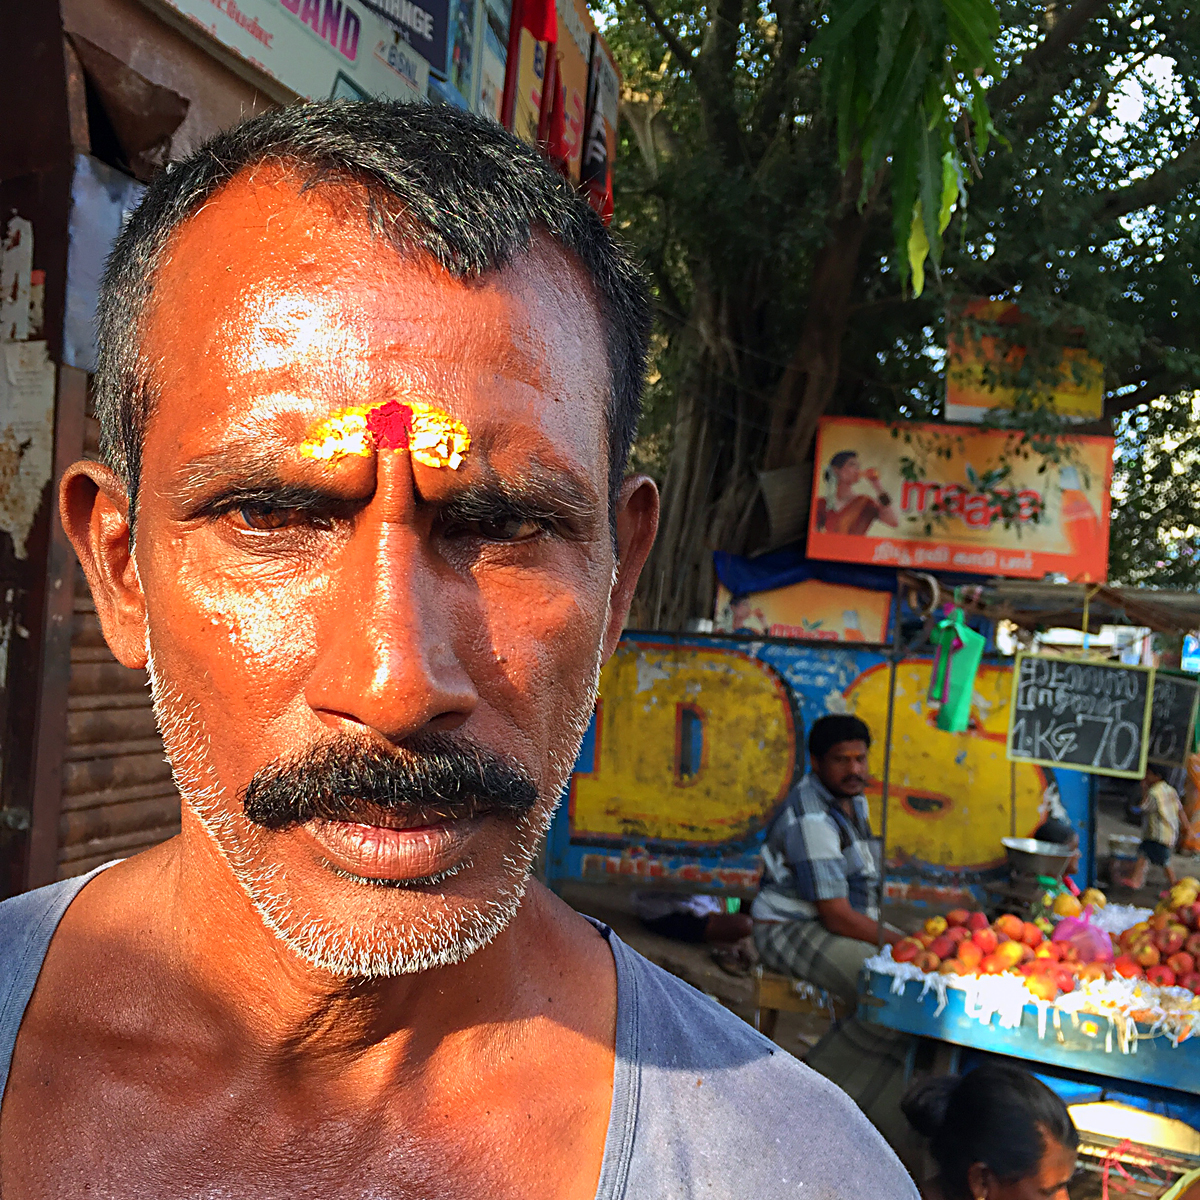 INDIEN Chennai Kanchipuram Tempel Menschen Tempel FINEST-onTour 2169.jpg